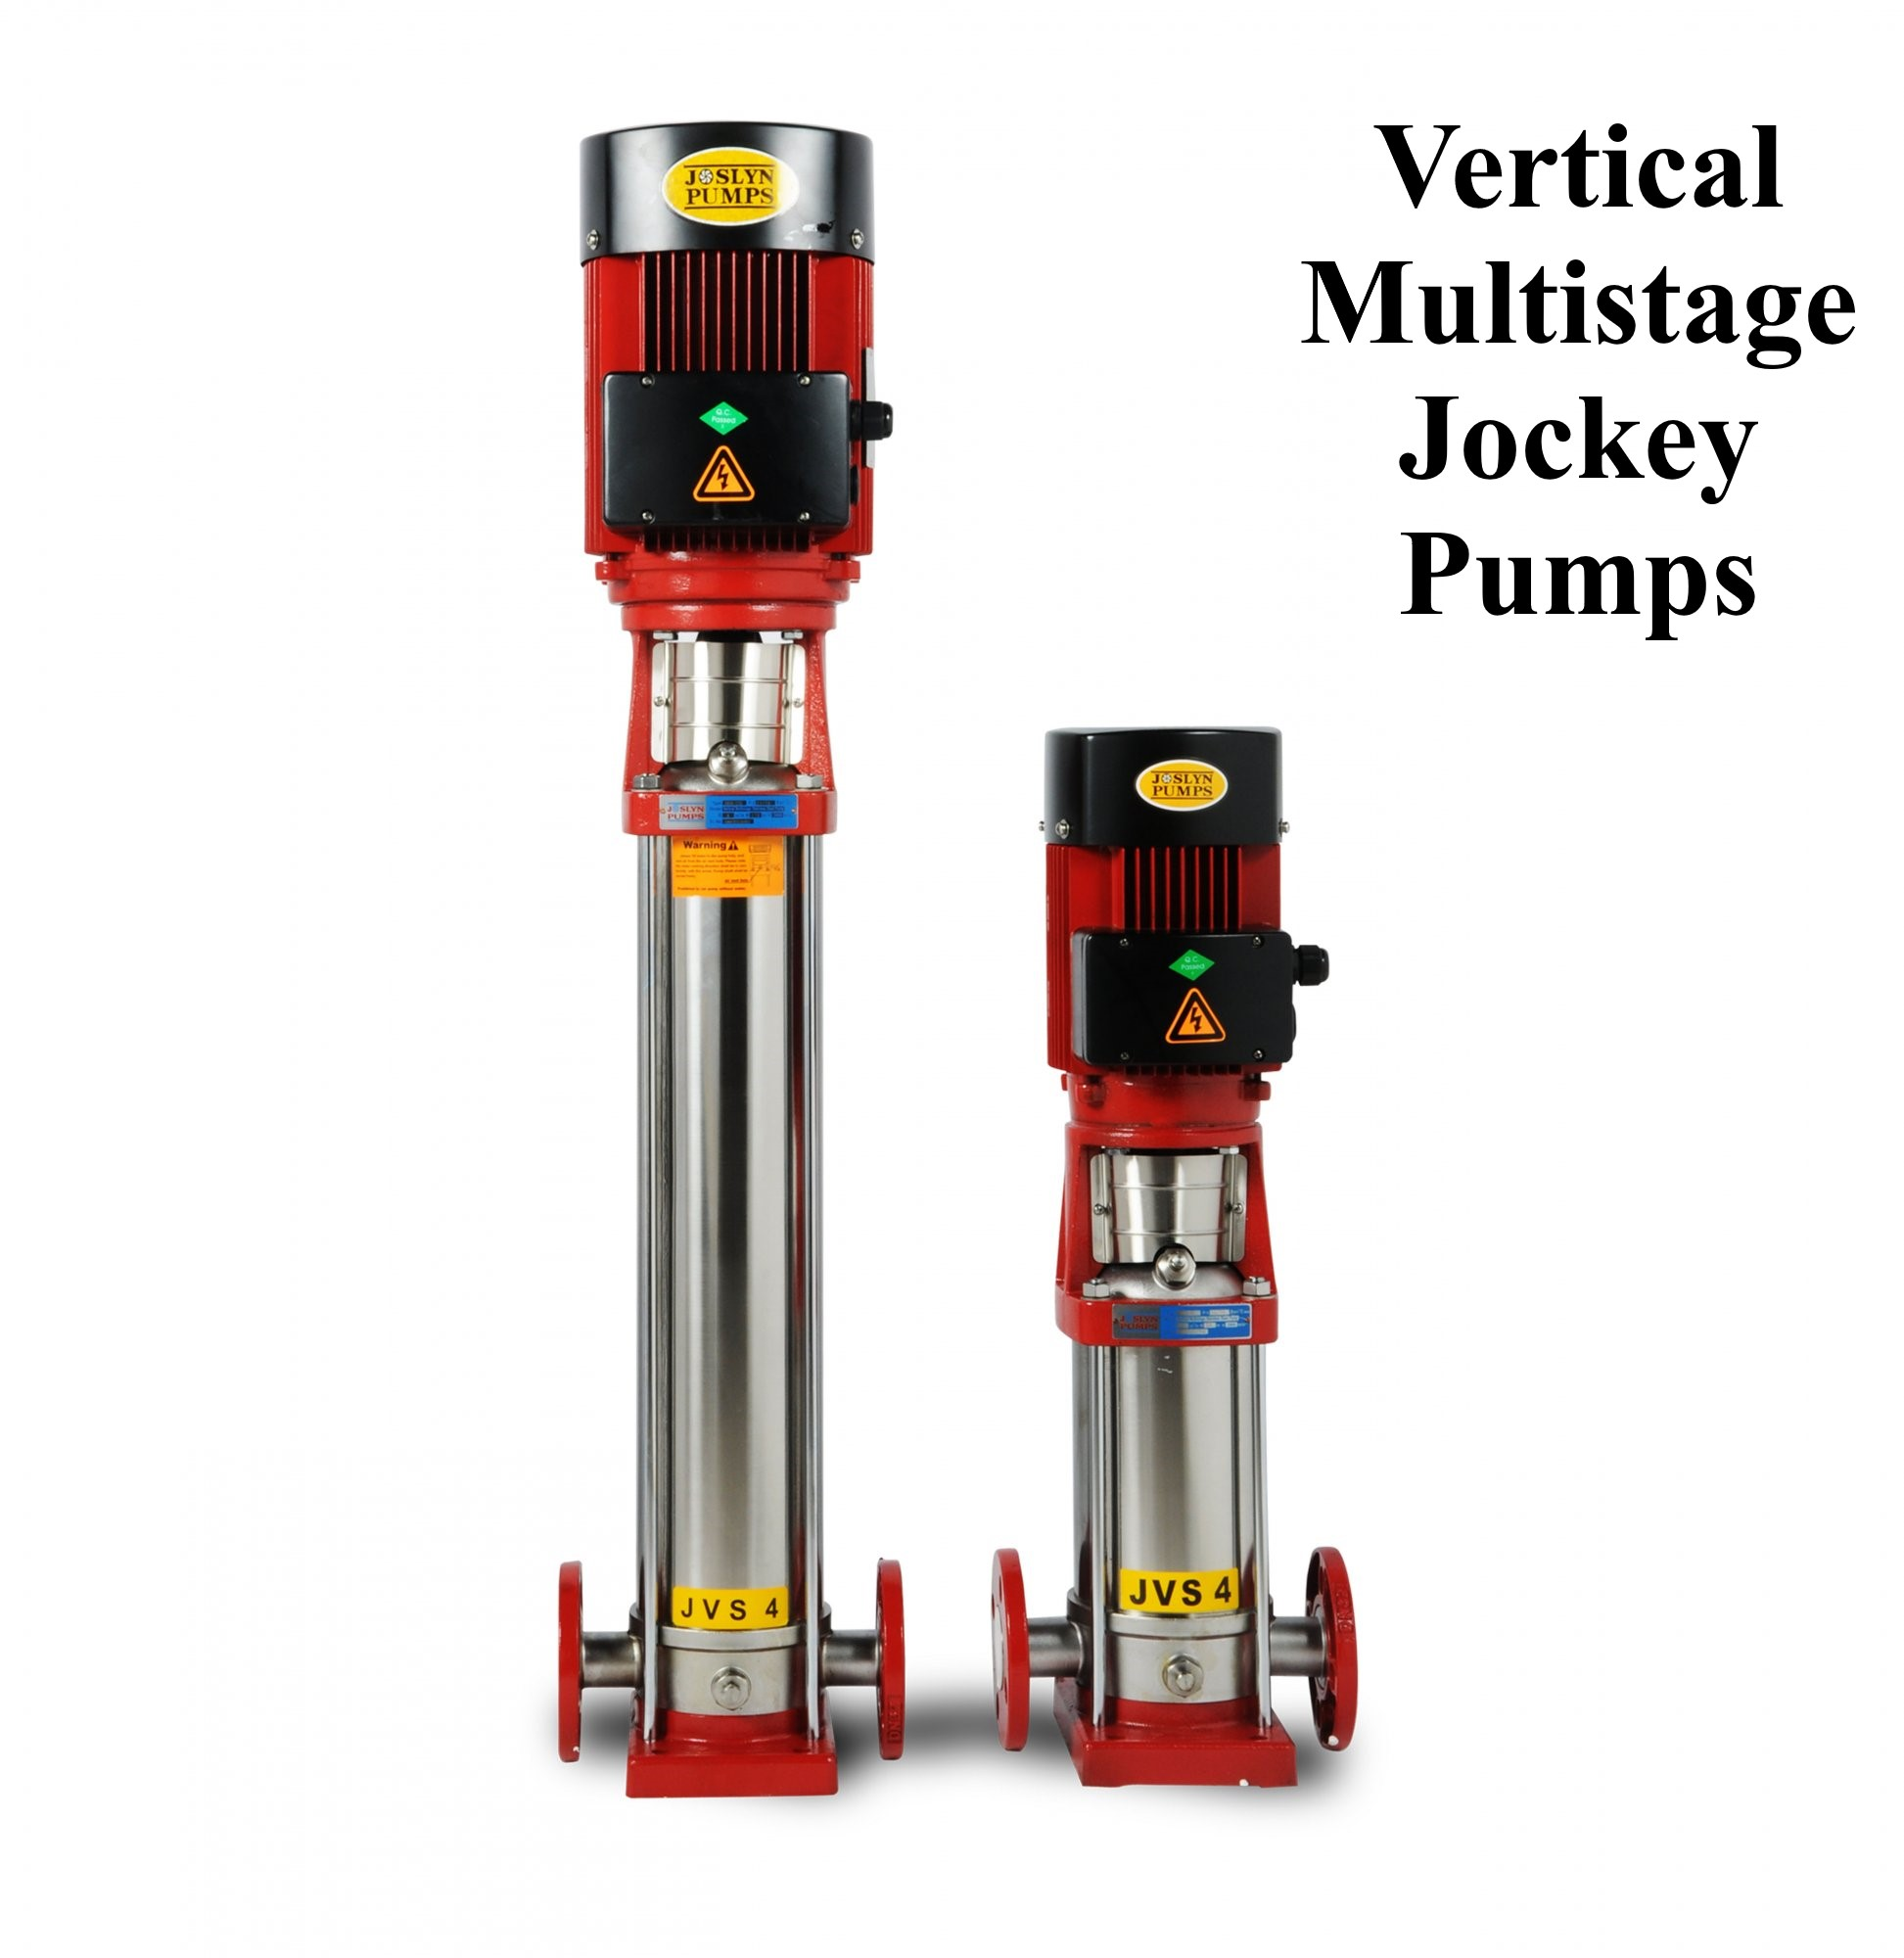 Vertical_Multistage_Jockey_Pumps_2_1447850428_wz530